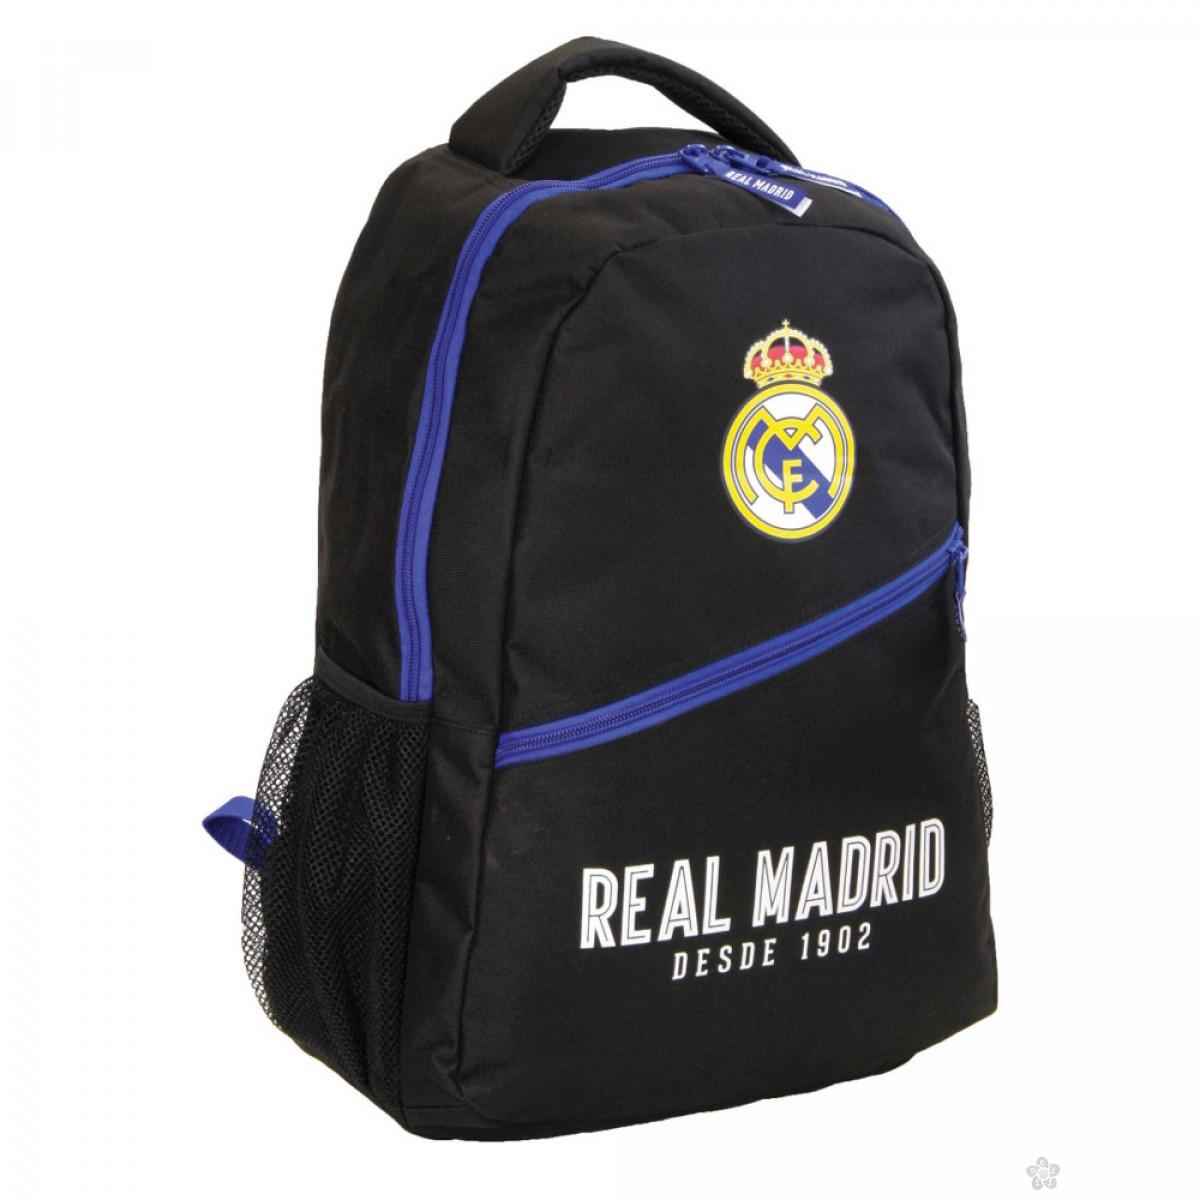 Ovalni ranac Real Madrid crni 53232